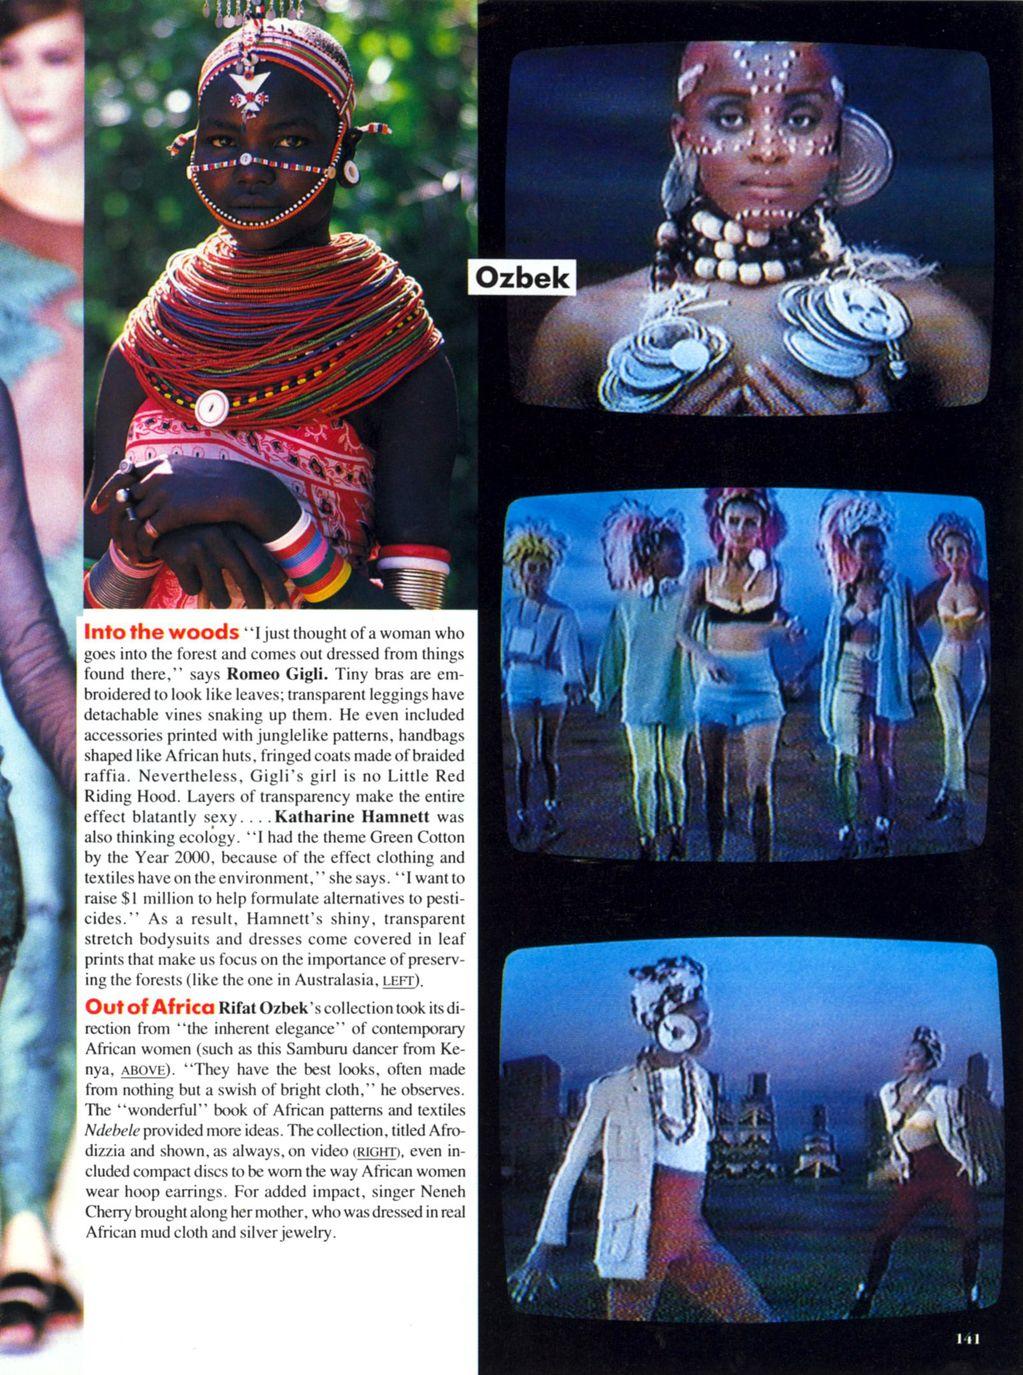 Vogue (US) January 1991 | Fashion 1991 10.jpg